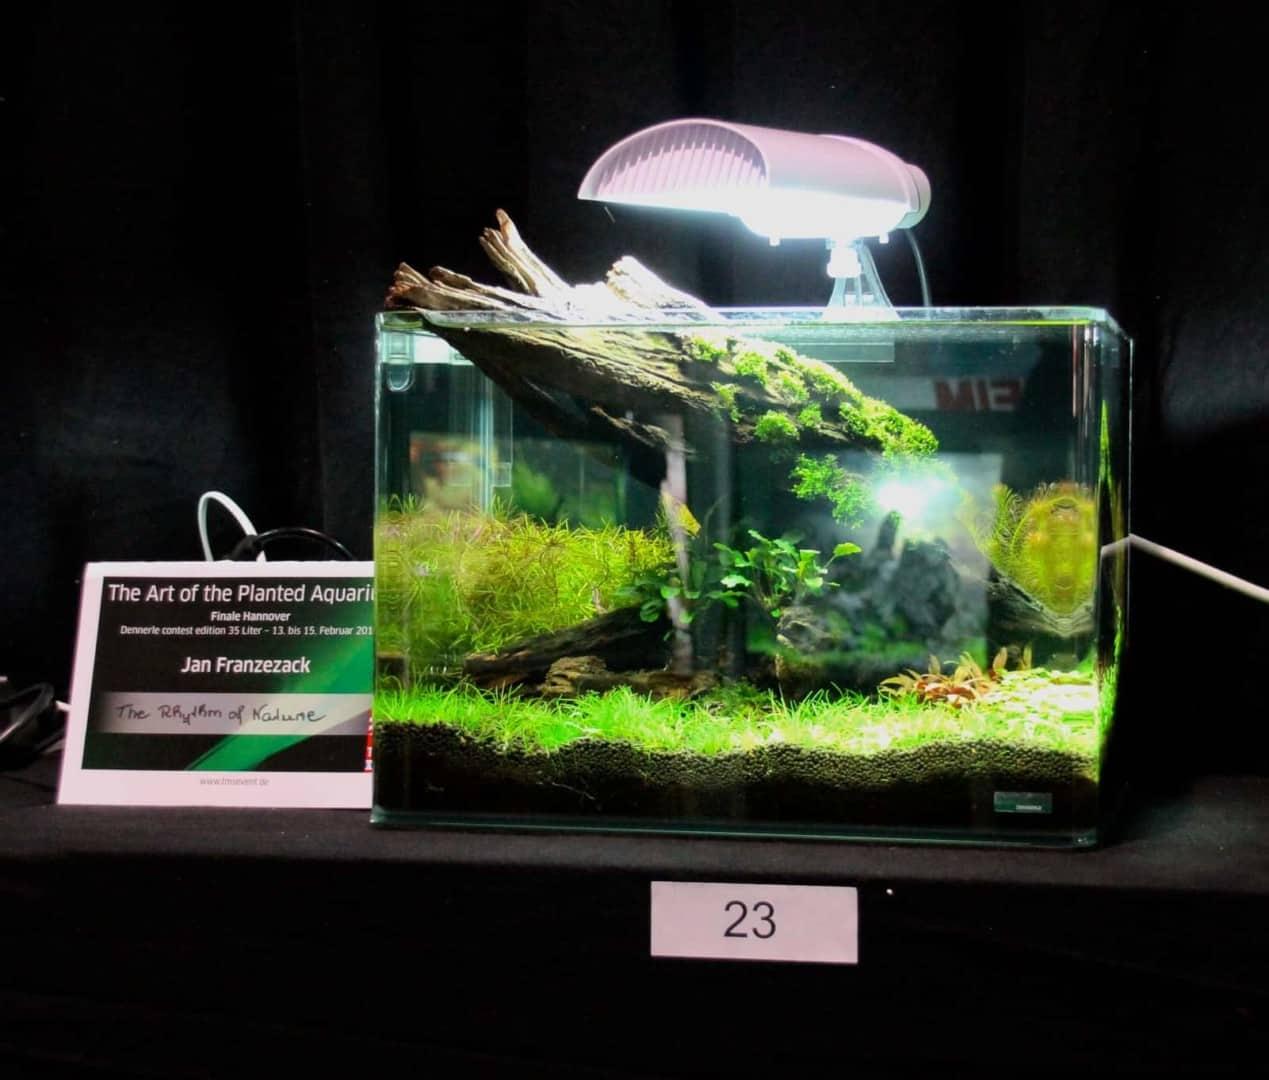 Heimtiermesse Hannover 2015 - THE ART OF THE PLANTED AQUARIUM 48